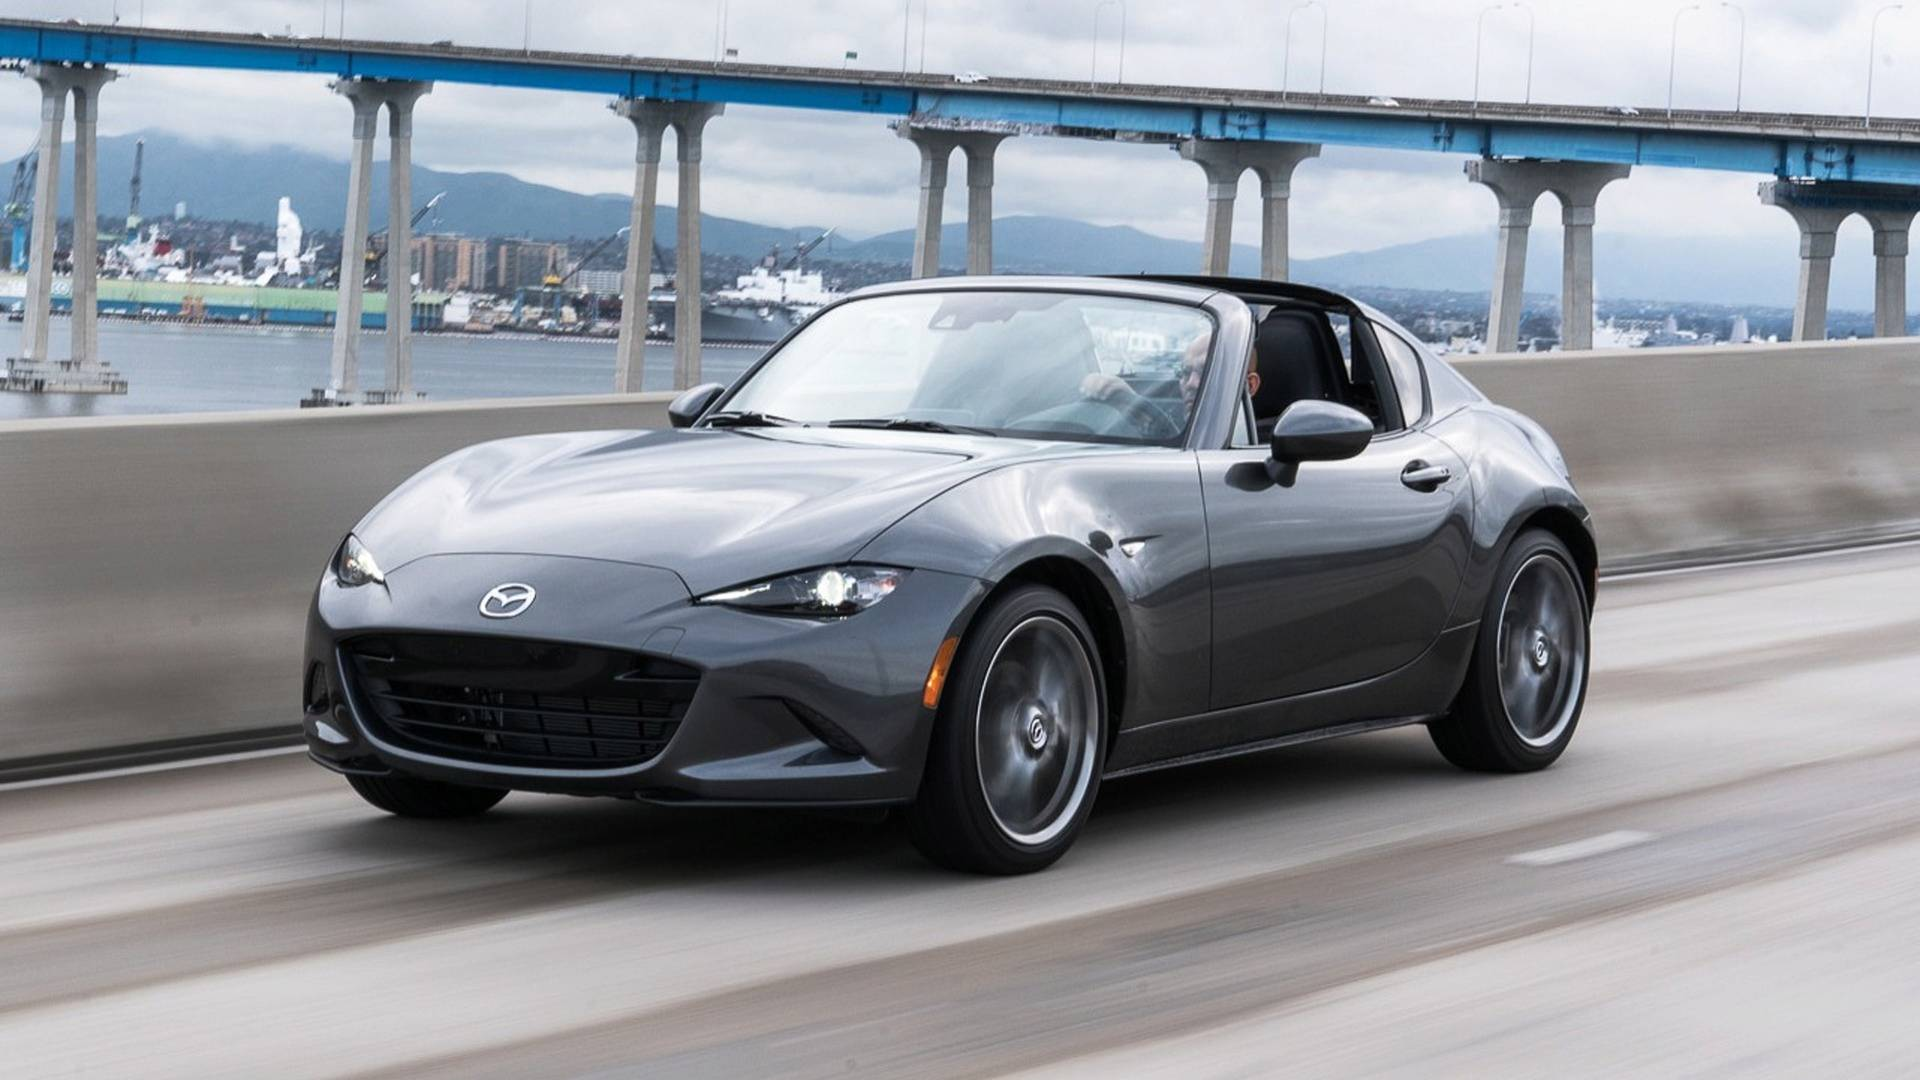 Mx 5 Rf >> Mazda Mx 5 Miata Rf Gets Even More Power For 2019